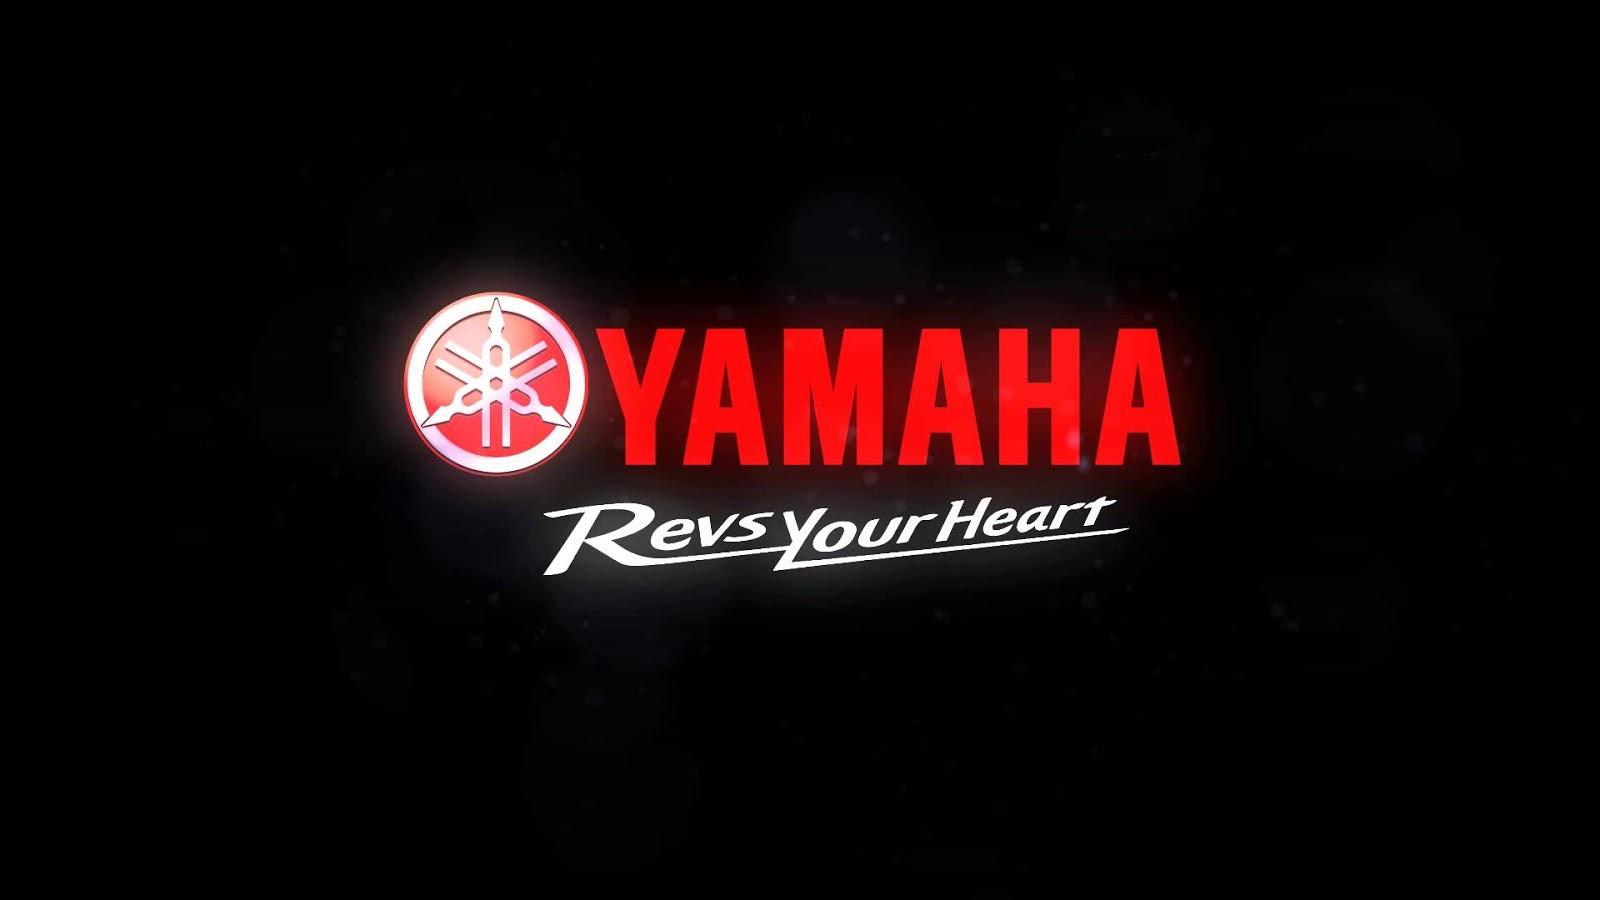 Rockstar Energy Wallpaper For Iphone Imagehub Yamaha Logo Hd